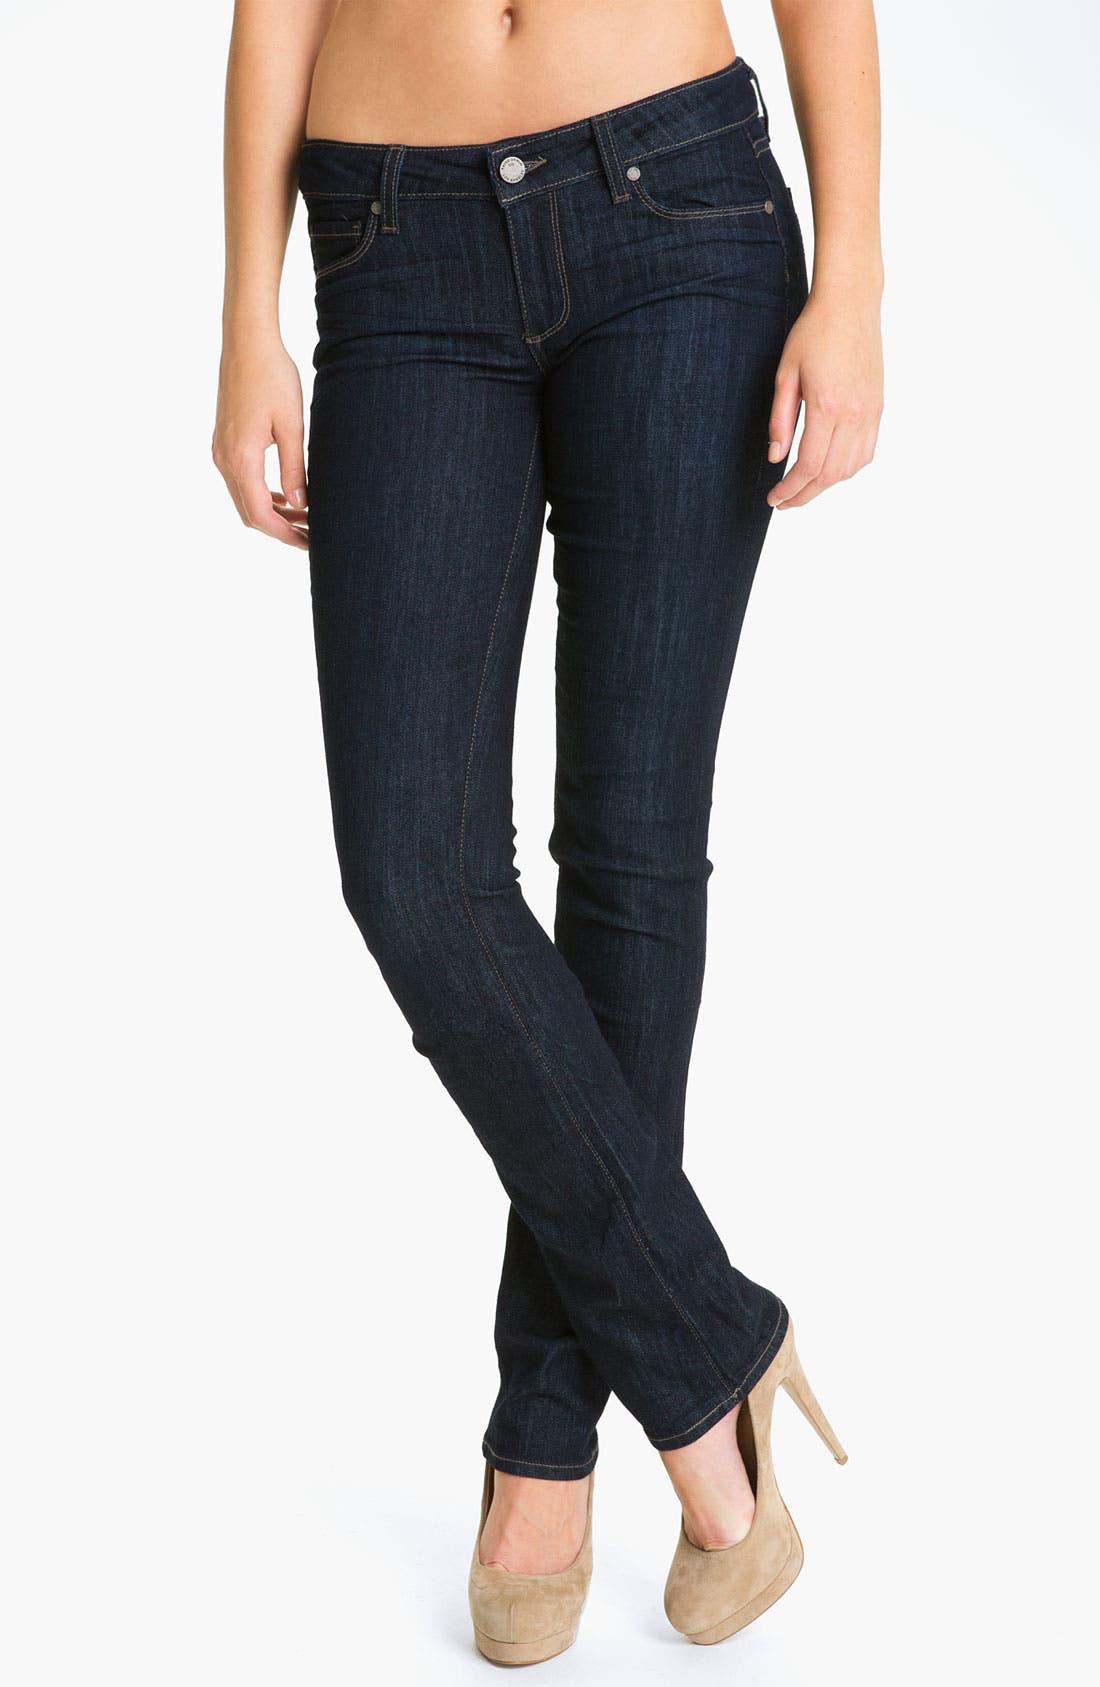 Alternate Image 1 Selected - Paige Denim 'Skyline' Straight Leg Stretch Jeans (Dream)